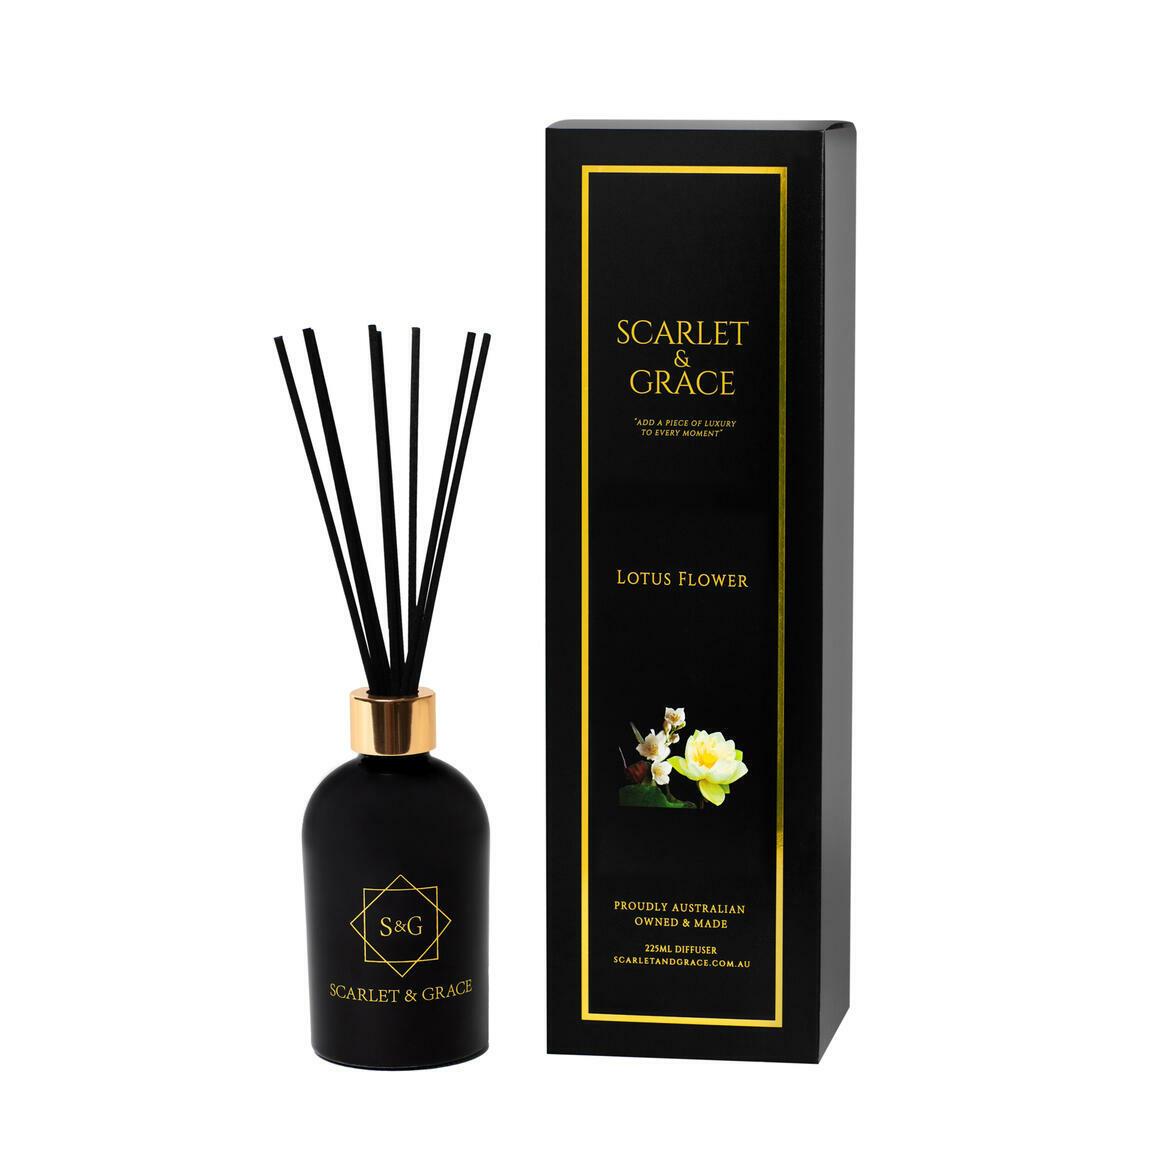 Scarlet & Grace 225ml Diffuser - Lotus Flower Fragrance   Trada Marketplace